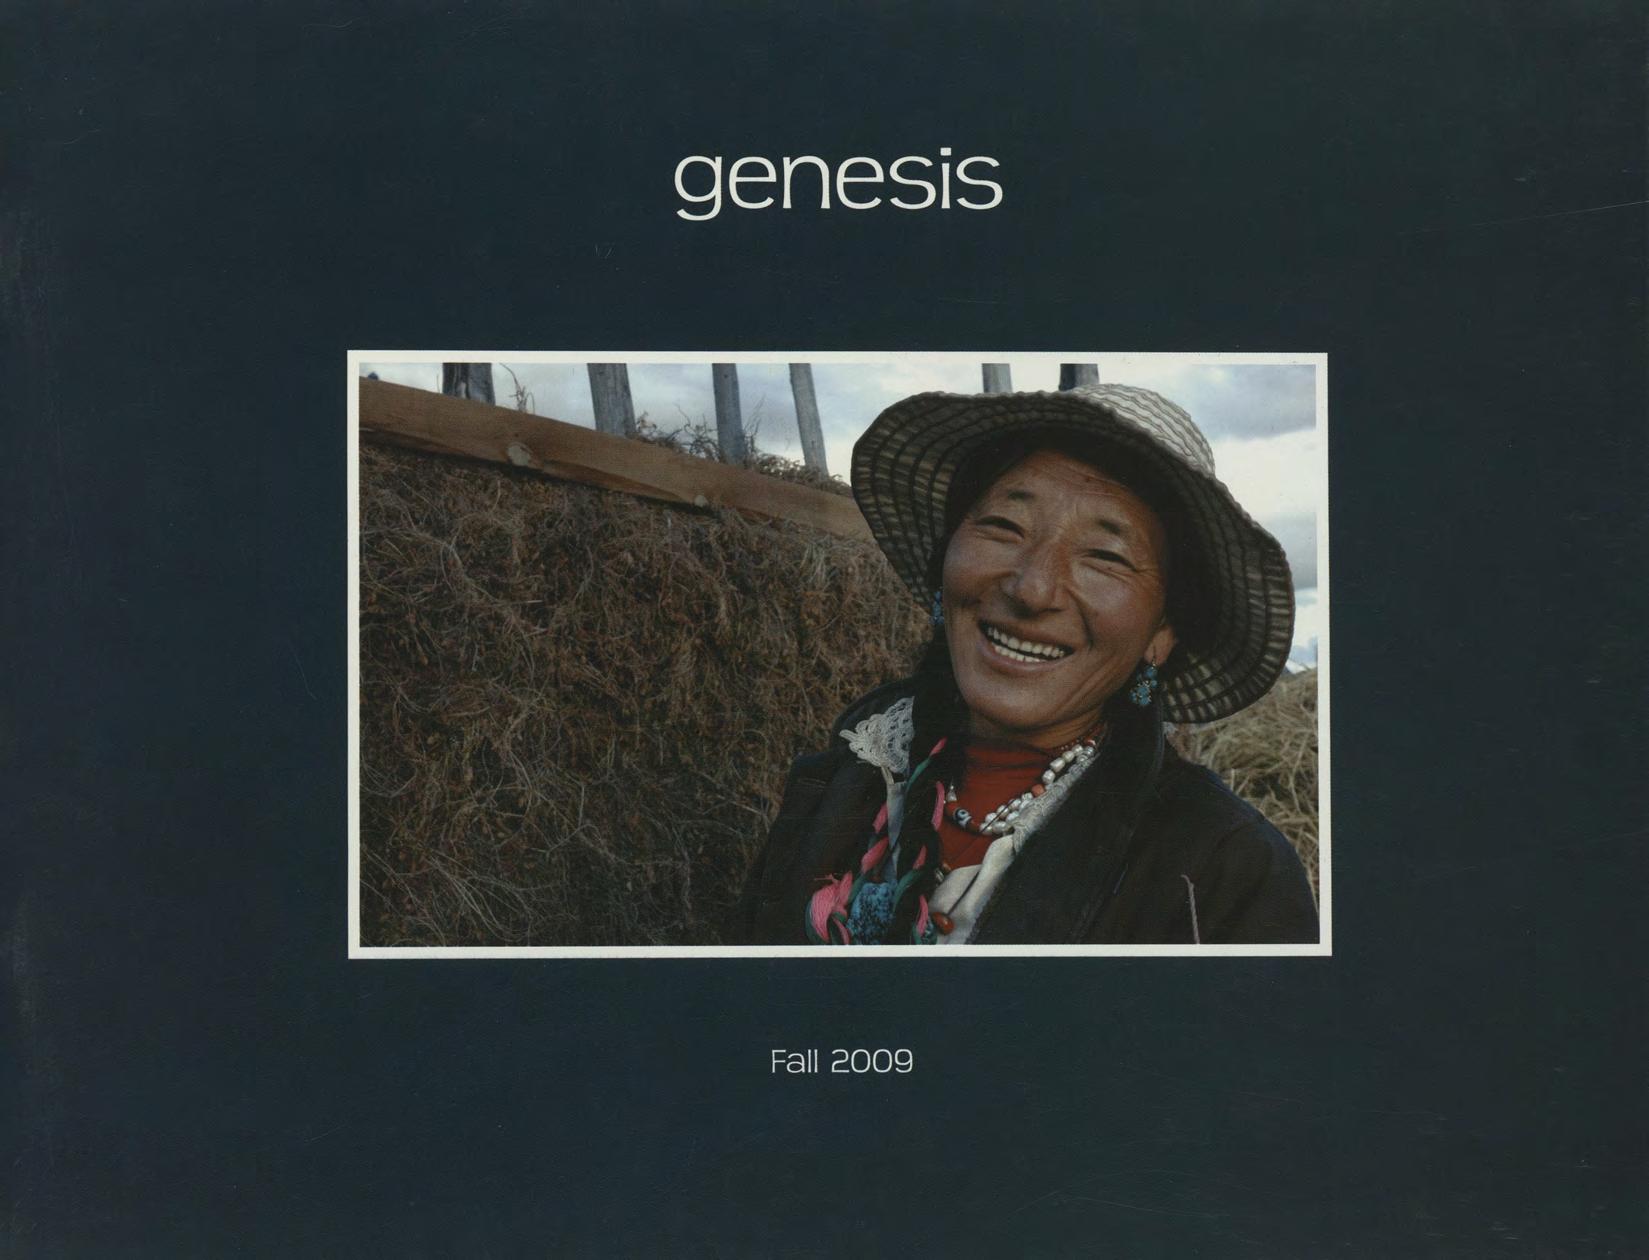 genesis fall 2009 cover